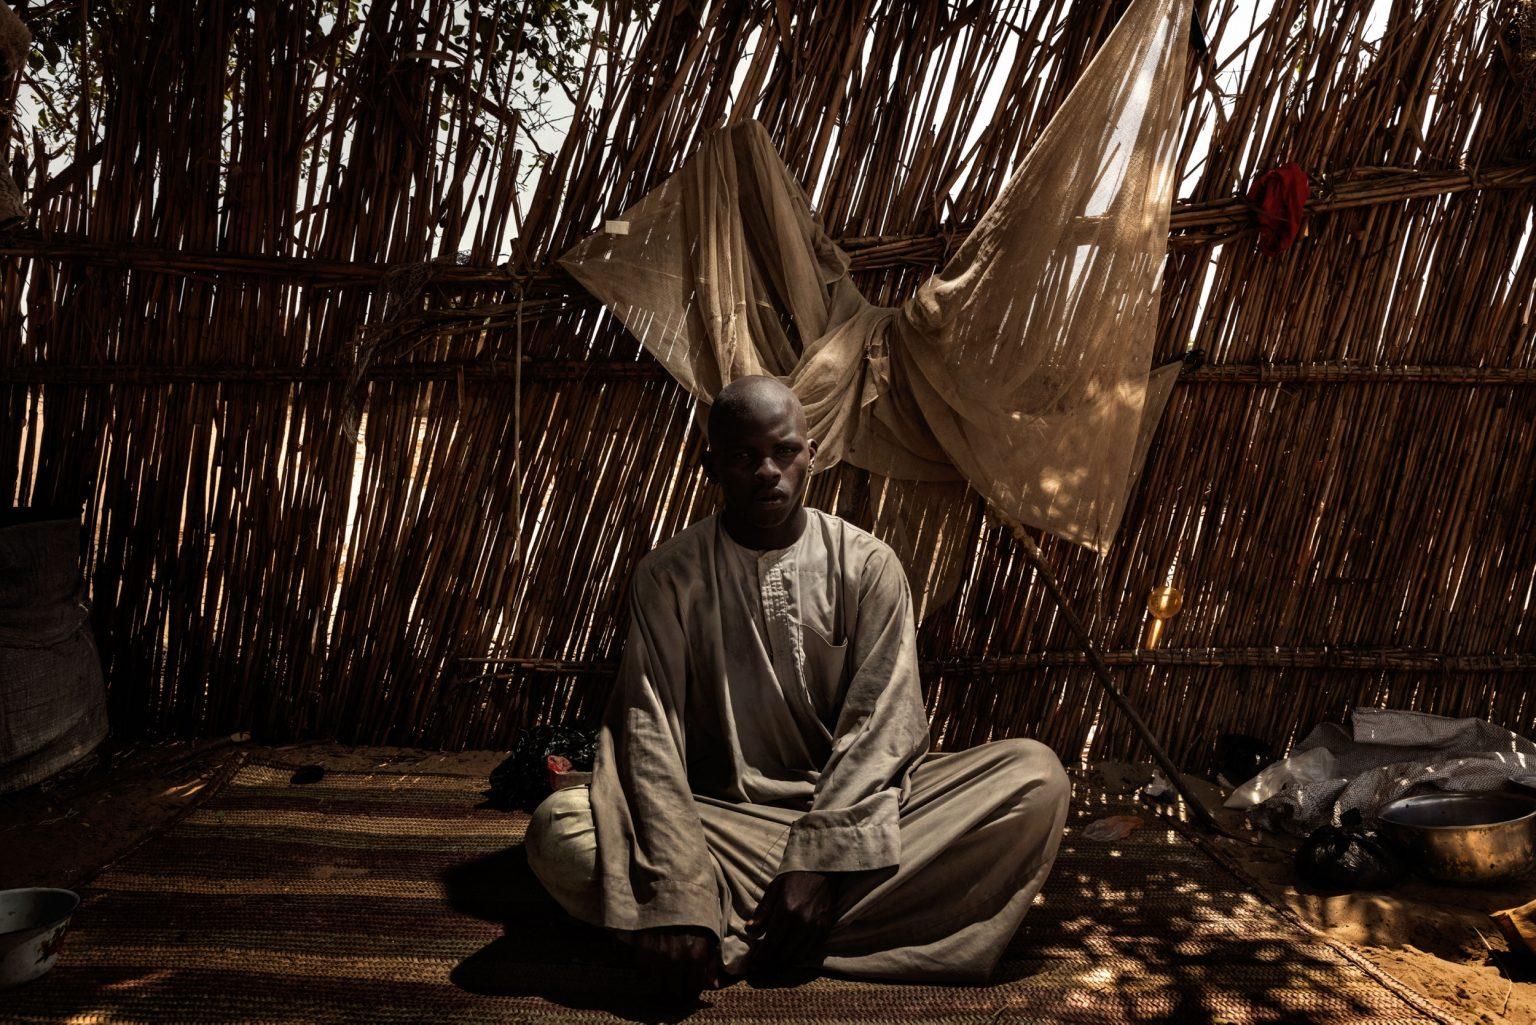 Africa, Chad, Dar es Salam, October 2018 - Madu Walli Alhadji Affeni, aged 26, was imprisoned for two years by Boko Haram, and forced to work on the land until the day he managed to escape. >< Africa, Ciad, Dar es Salam, Ottobre 2018 - Madu Walli Alhadji Affeni, 26 anni, è stato imprigionato per due anni da Boko Haram ed è stato costretto a lavorare la terra fino al giorno in cui è riuscito a scappare.*** SPECIAL   FEE   APPLIES *** *** Local Caption *** 01362902